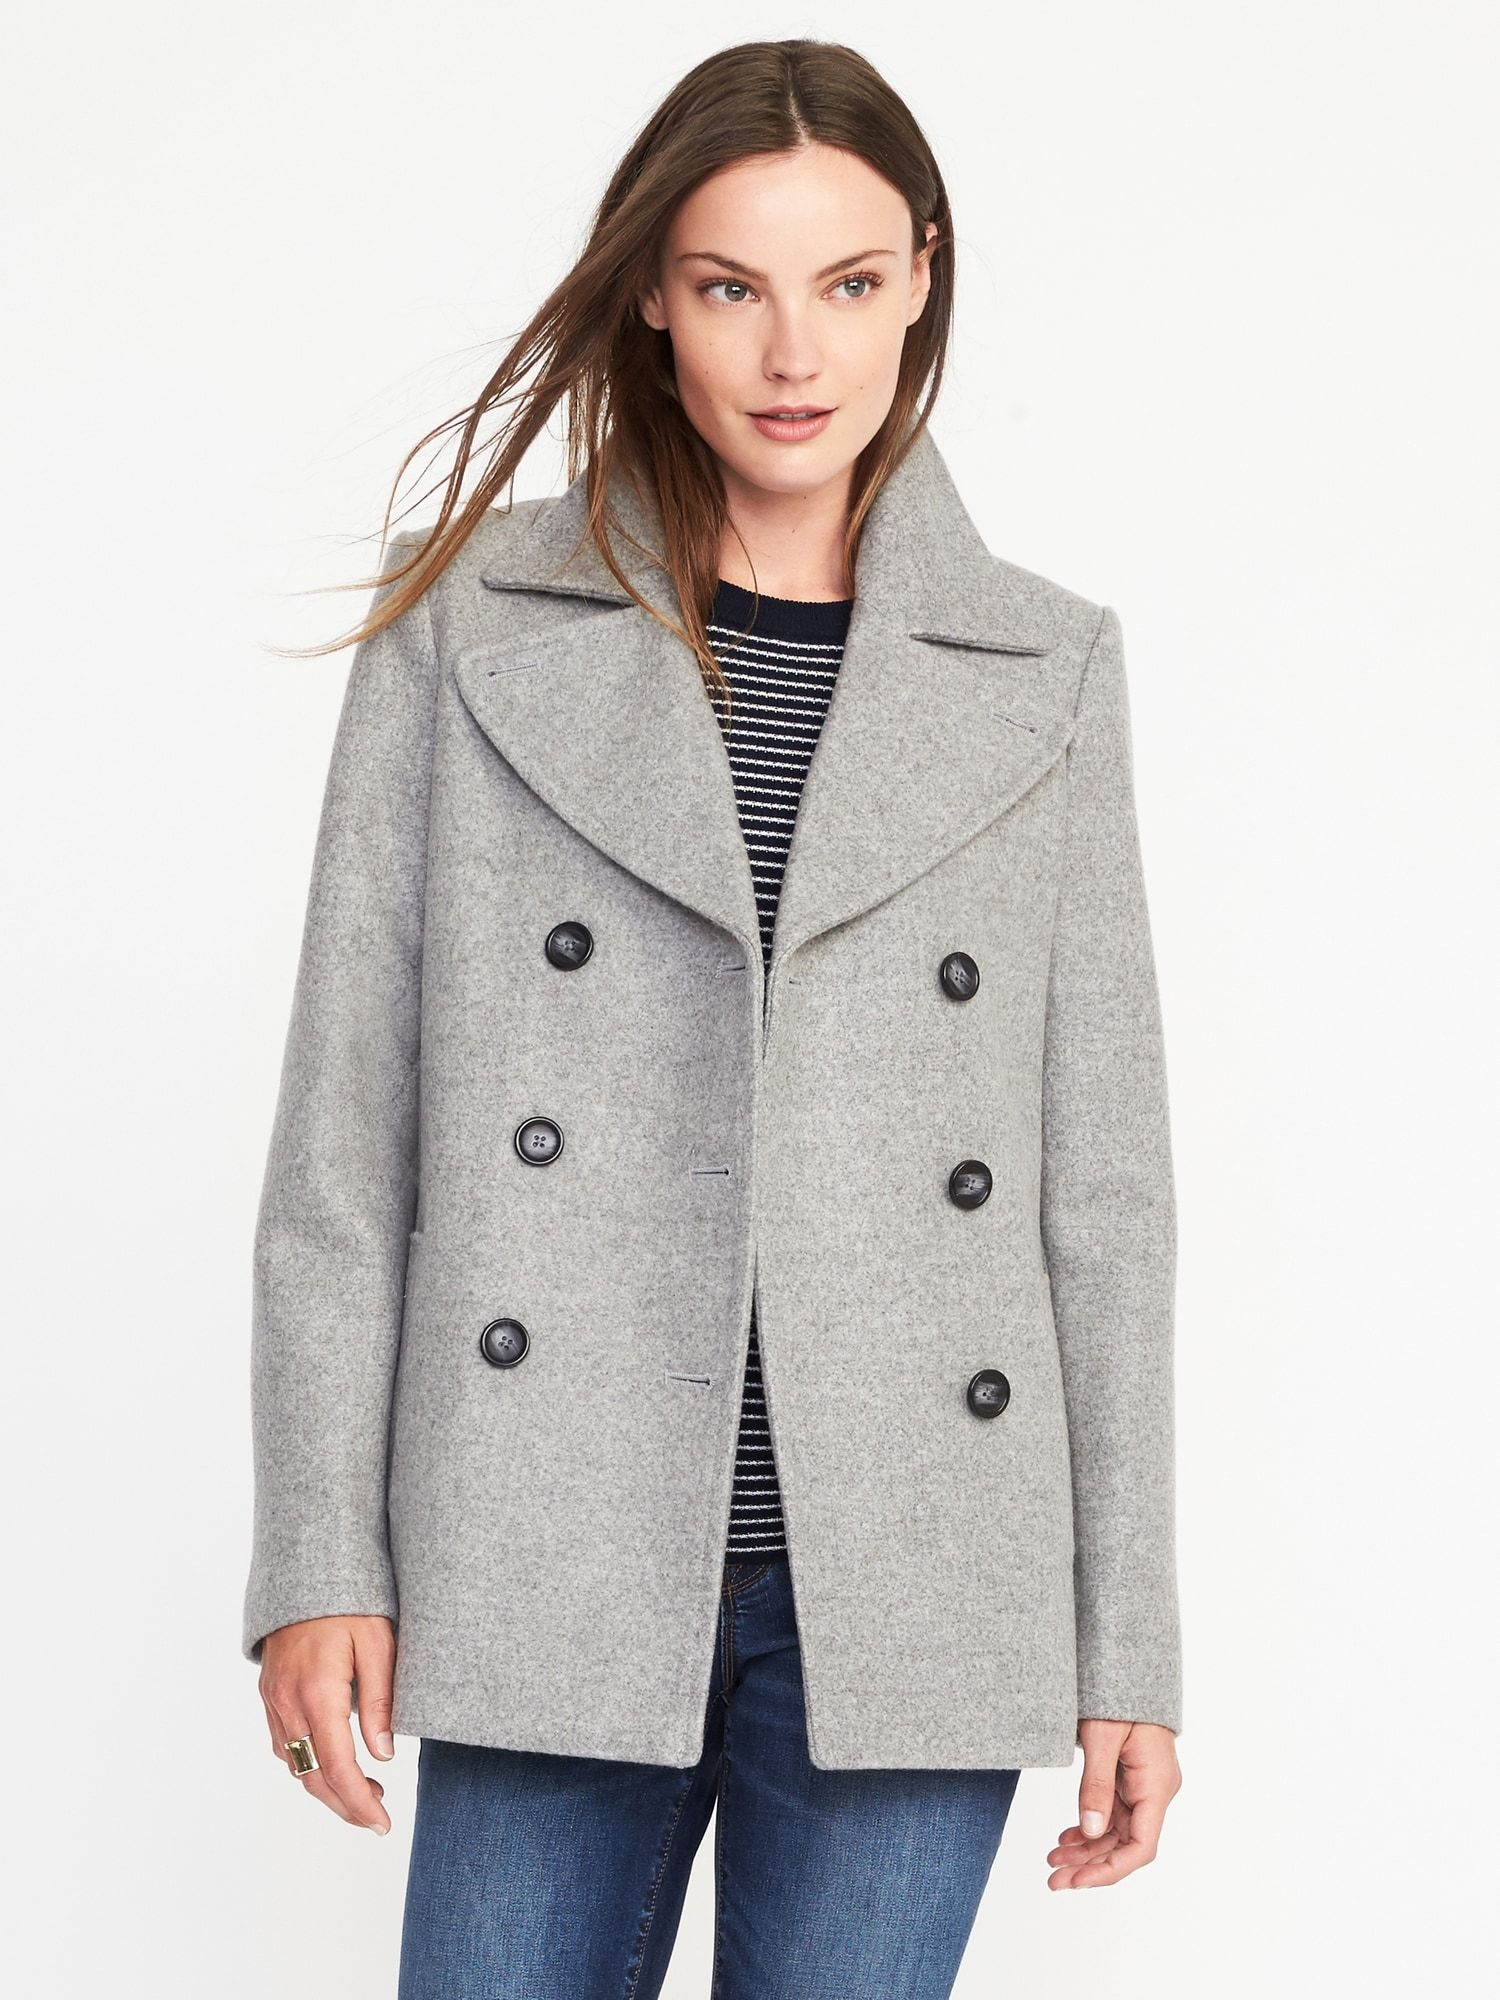 69aad6dd9a2f Classic Wool-Blend Peacoat for Women